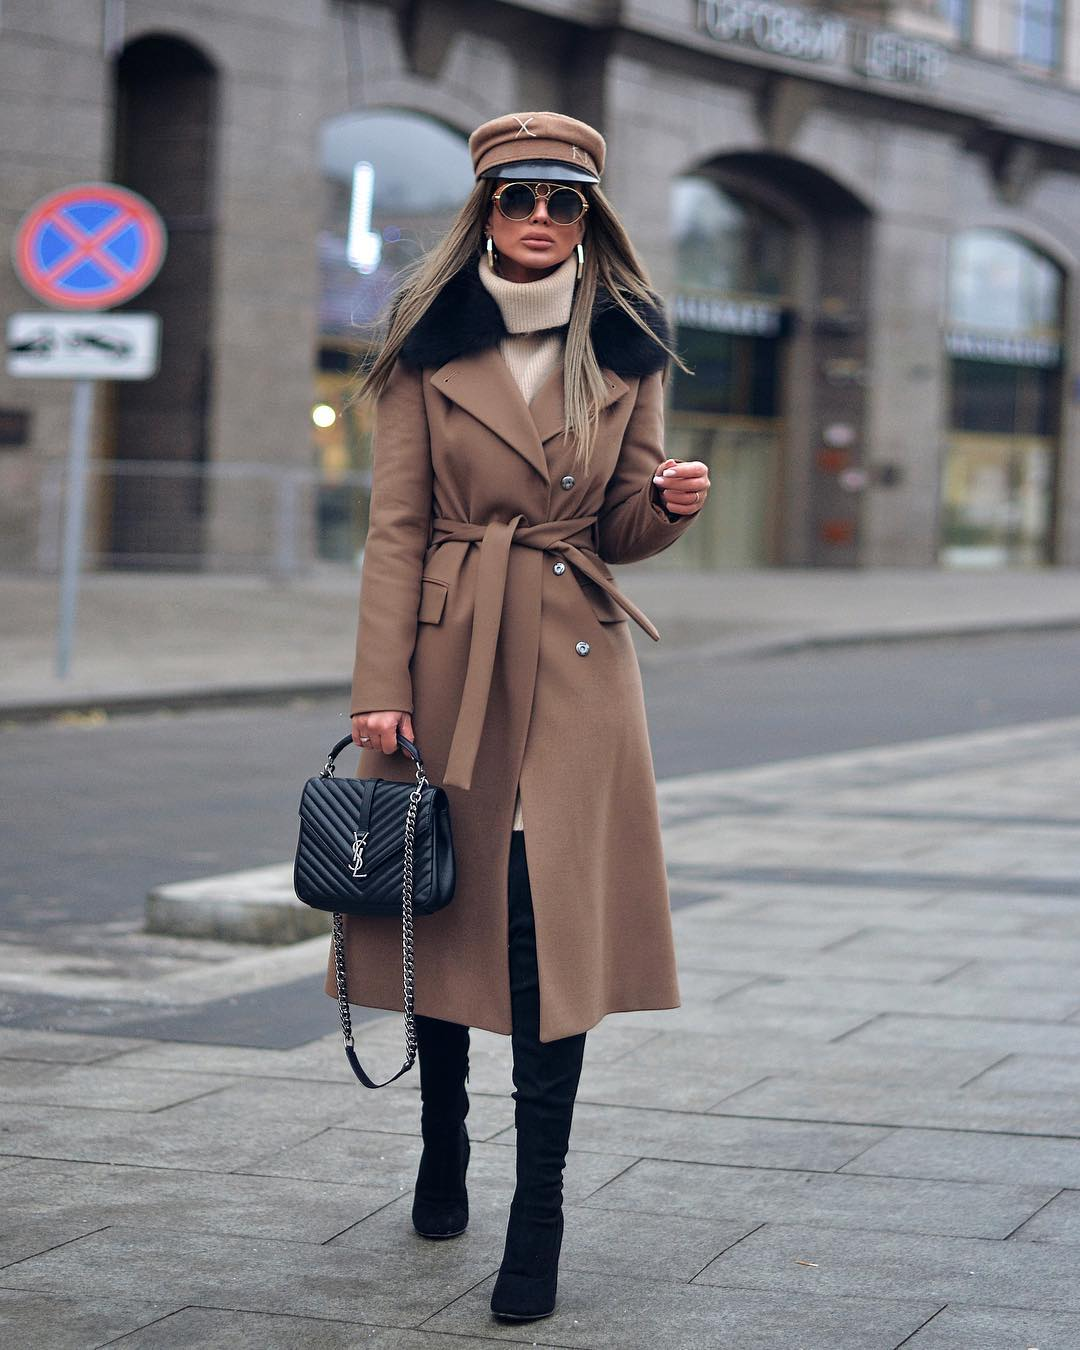 модные луки осень-зима 2019-2020 фото 2